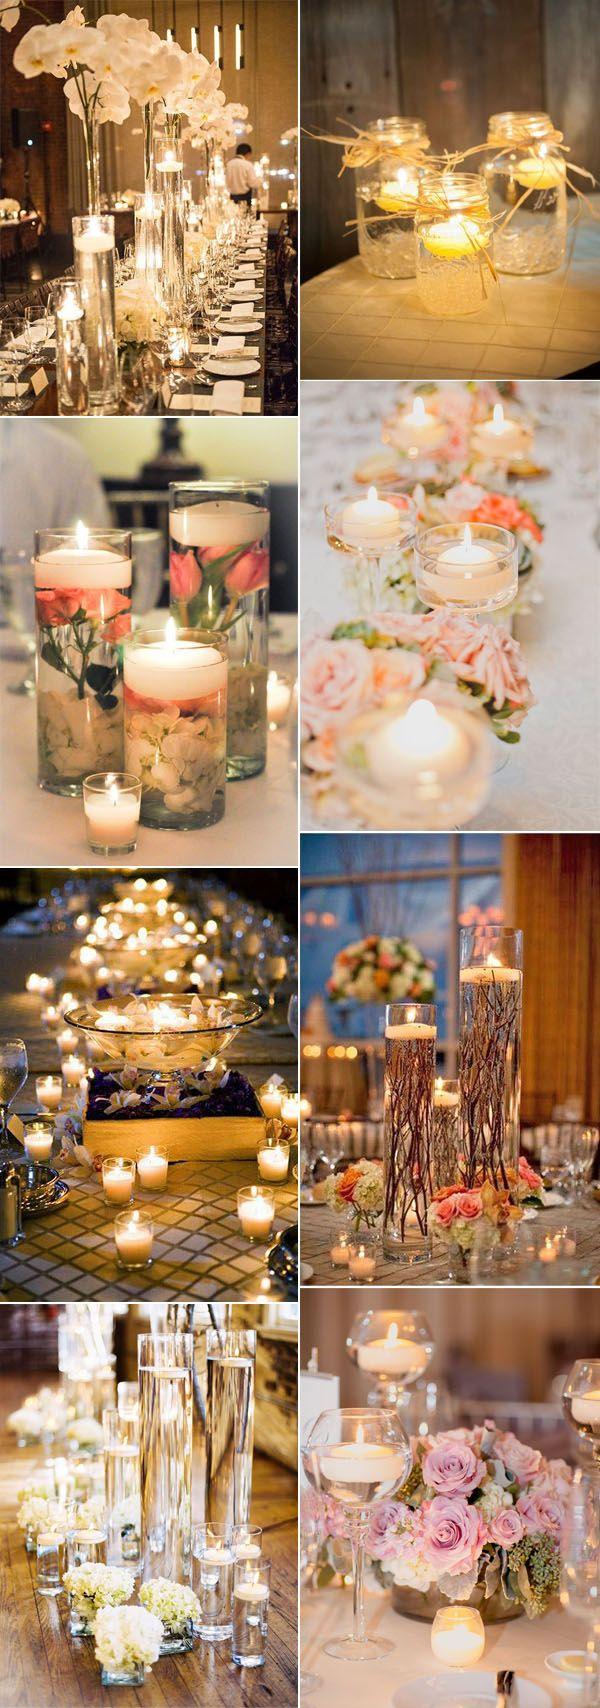 romantic floating candle lights wedding decor ideas